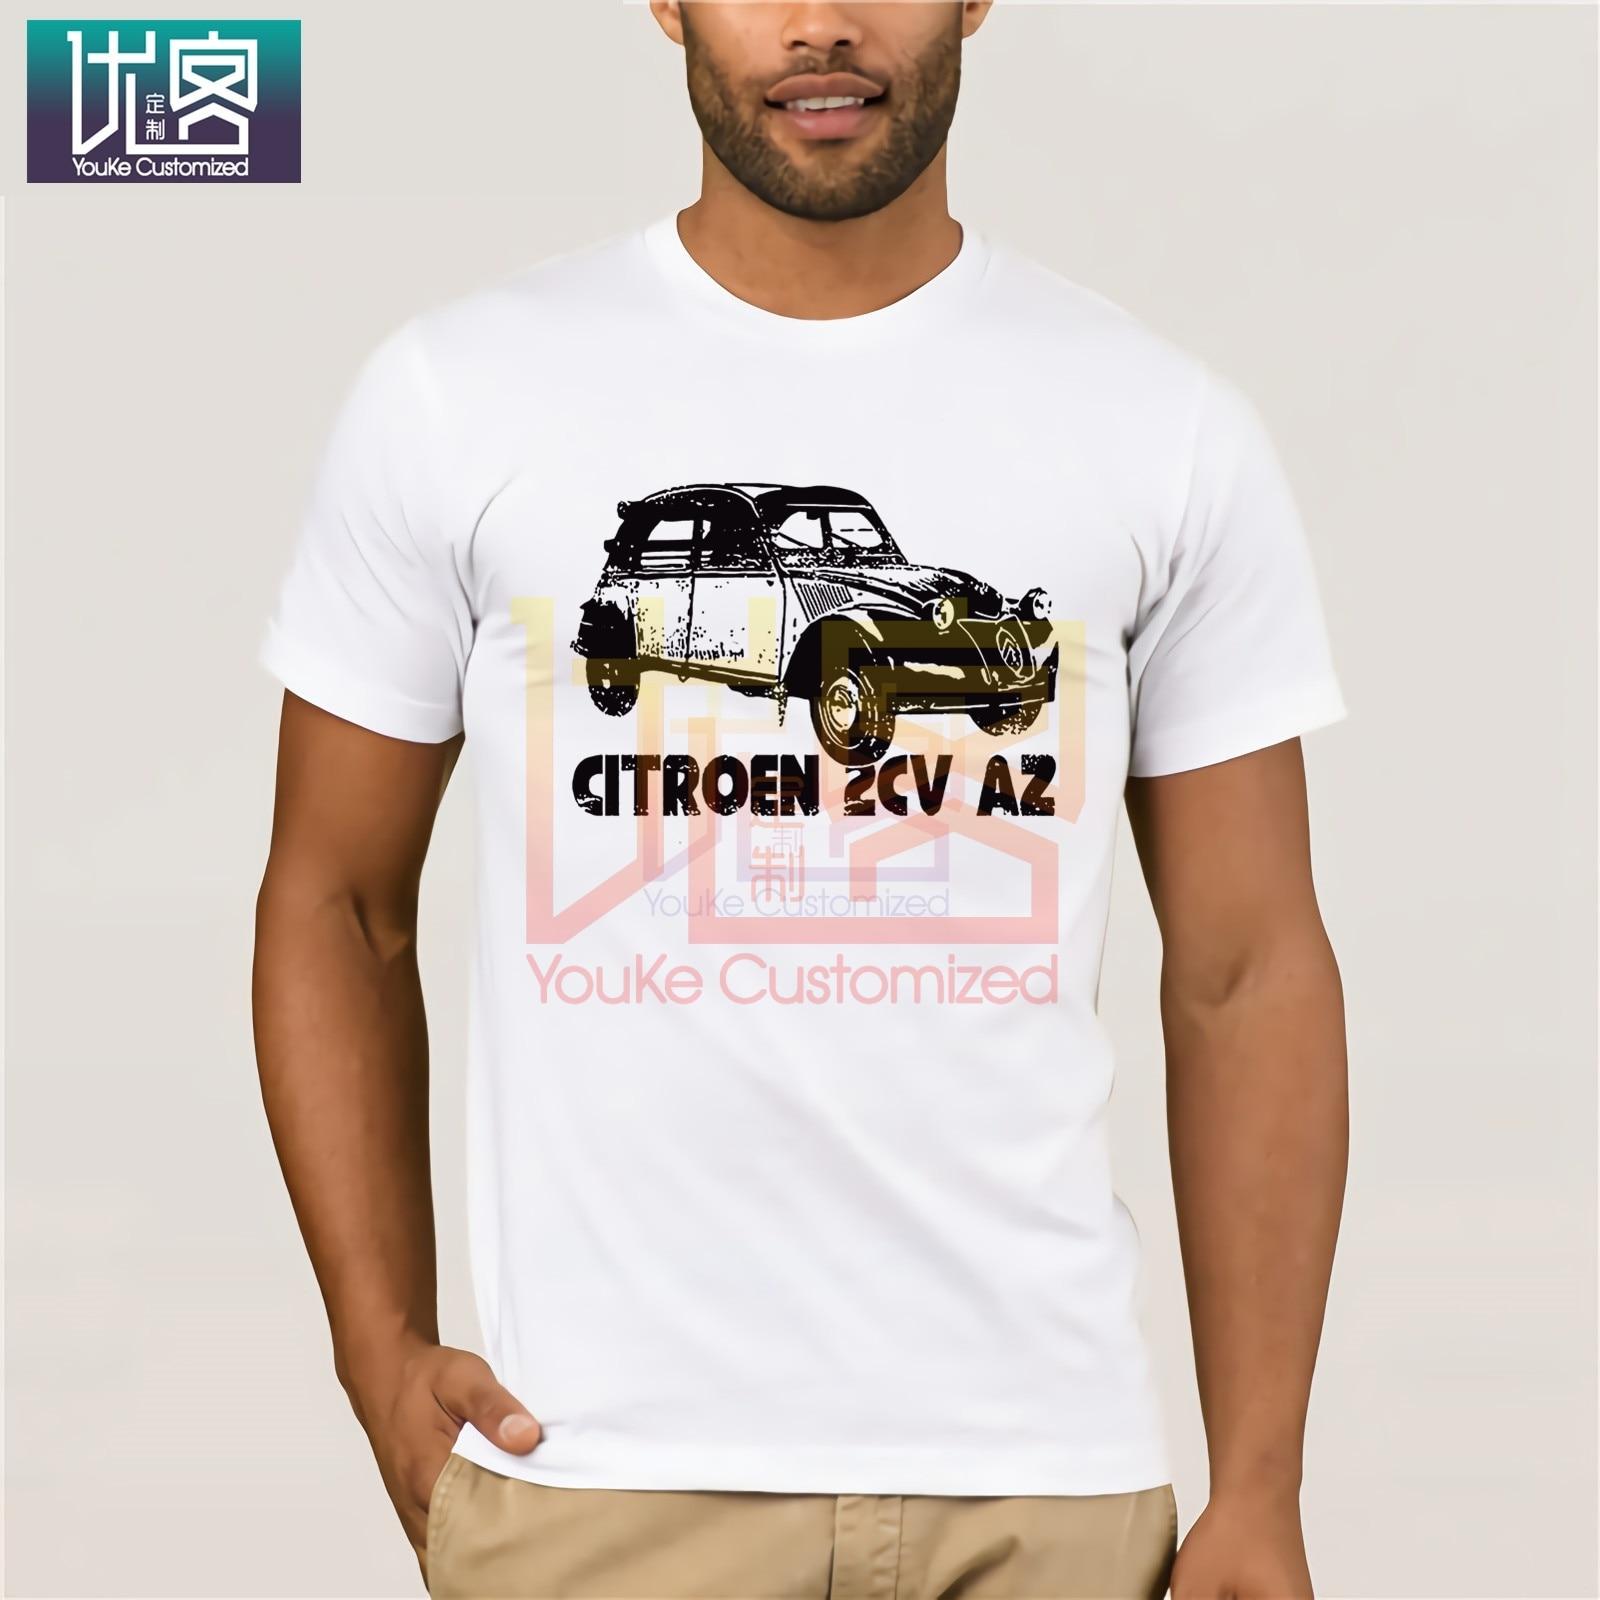 2020 nueva camiseta de Hip Hop de verano para hombres, camiseta 2 CV Citroen France, camiseta delgada de algodón para hombre